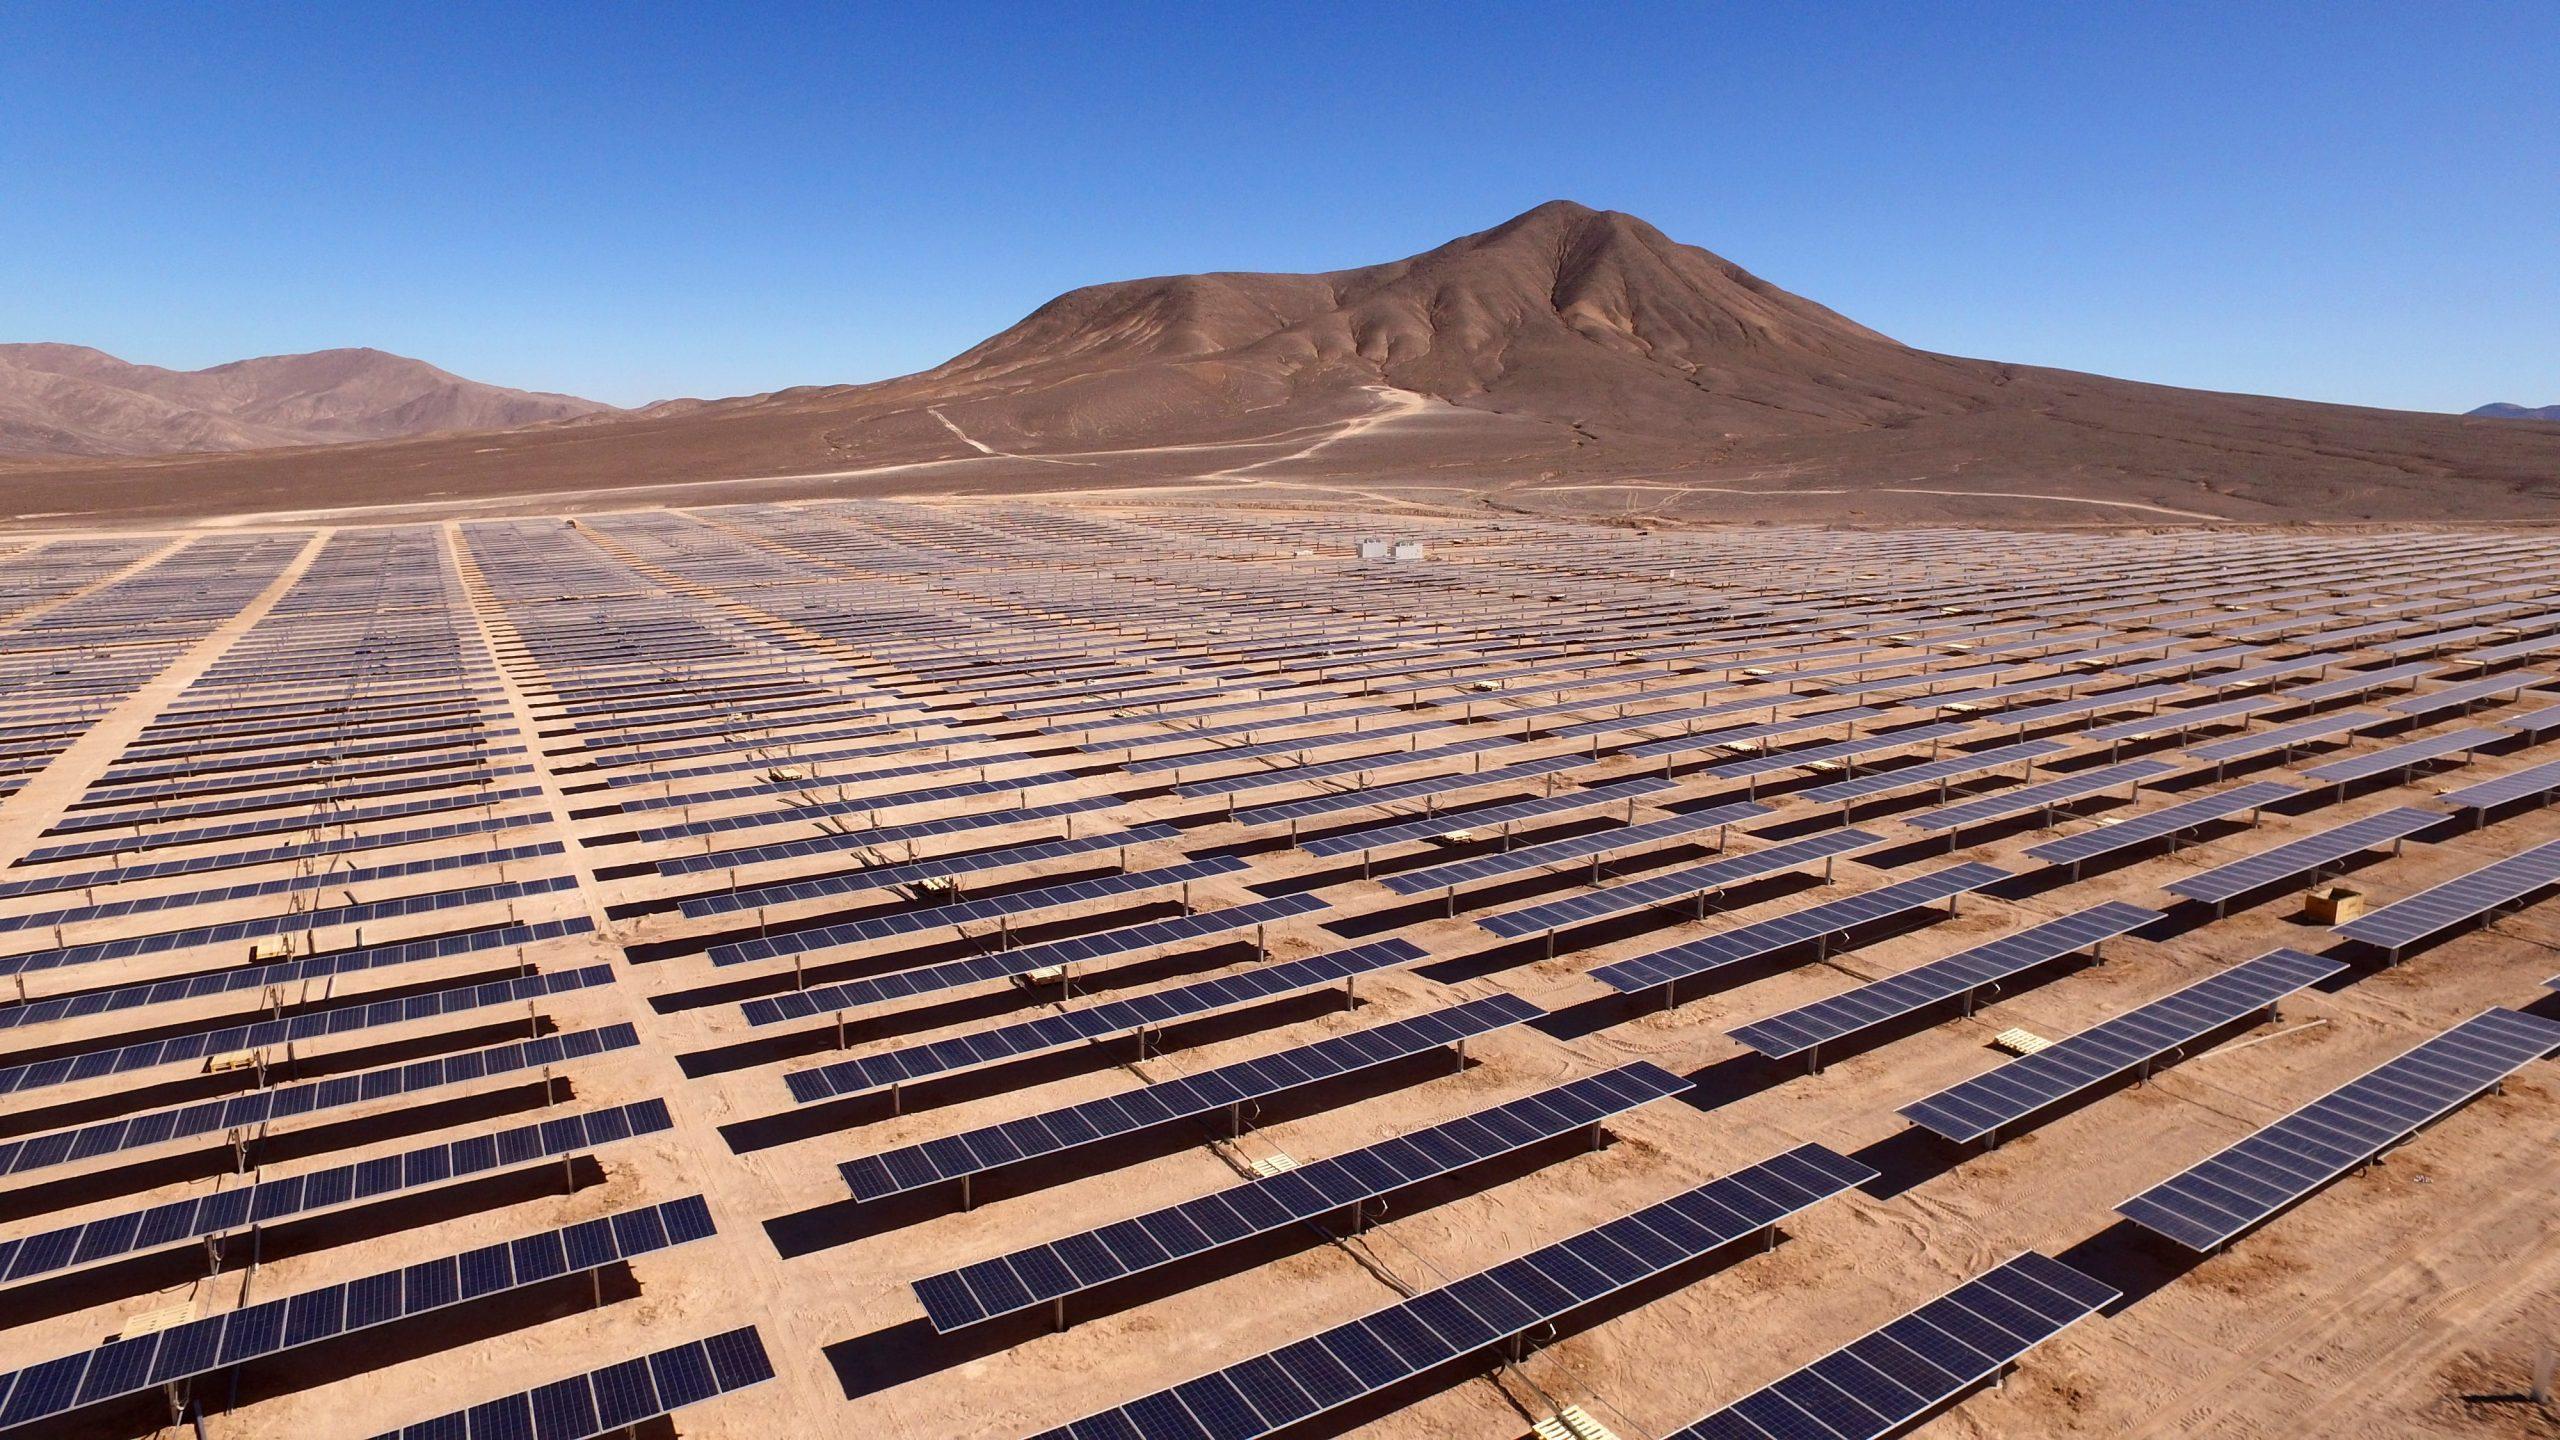 Recruitment - image of solar panels